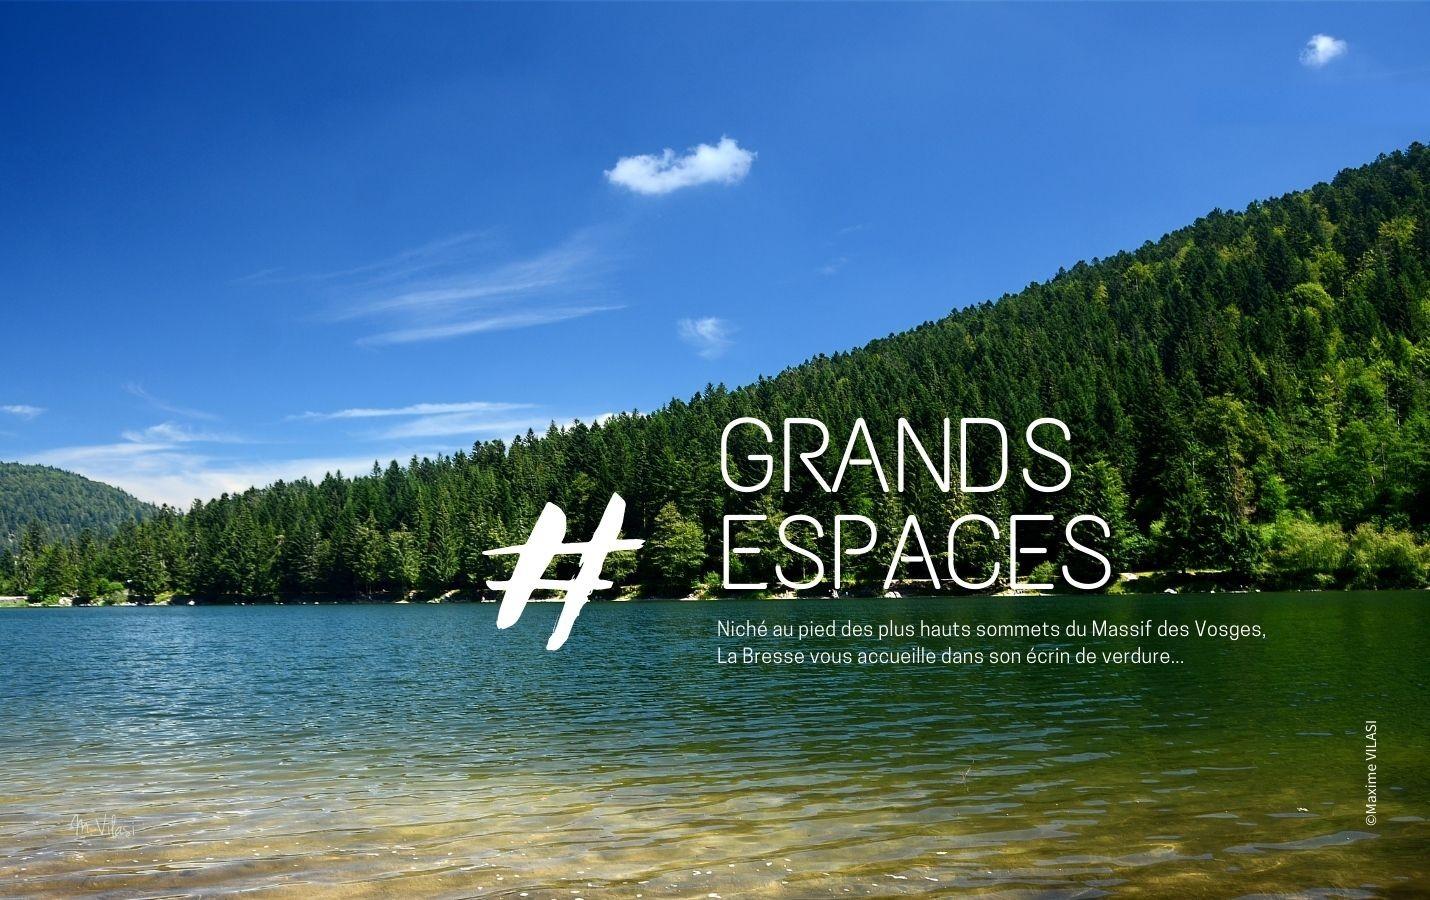 La Bresse Hautes-Vosges #GrandsEspaces